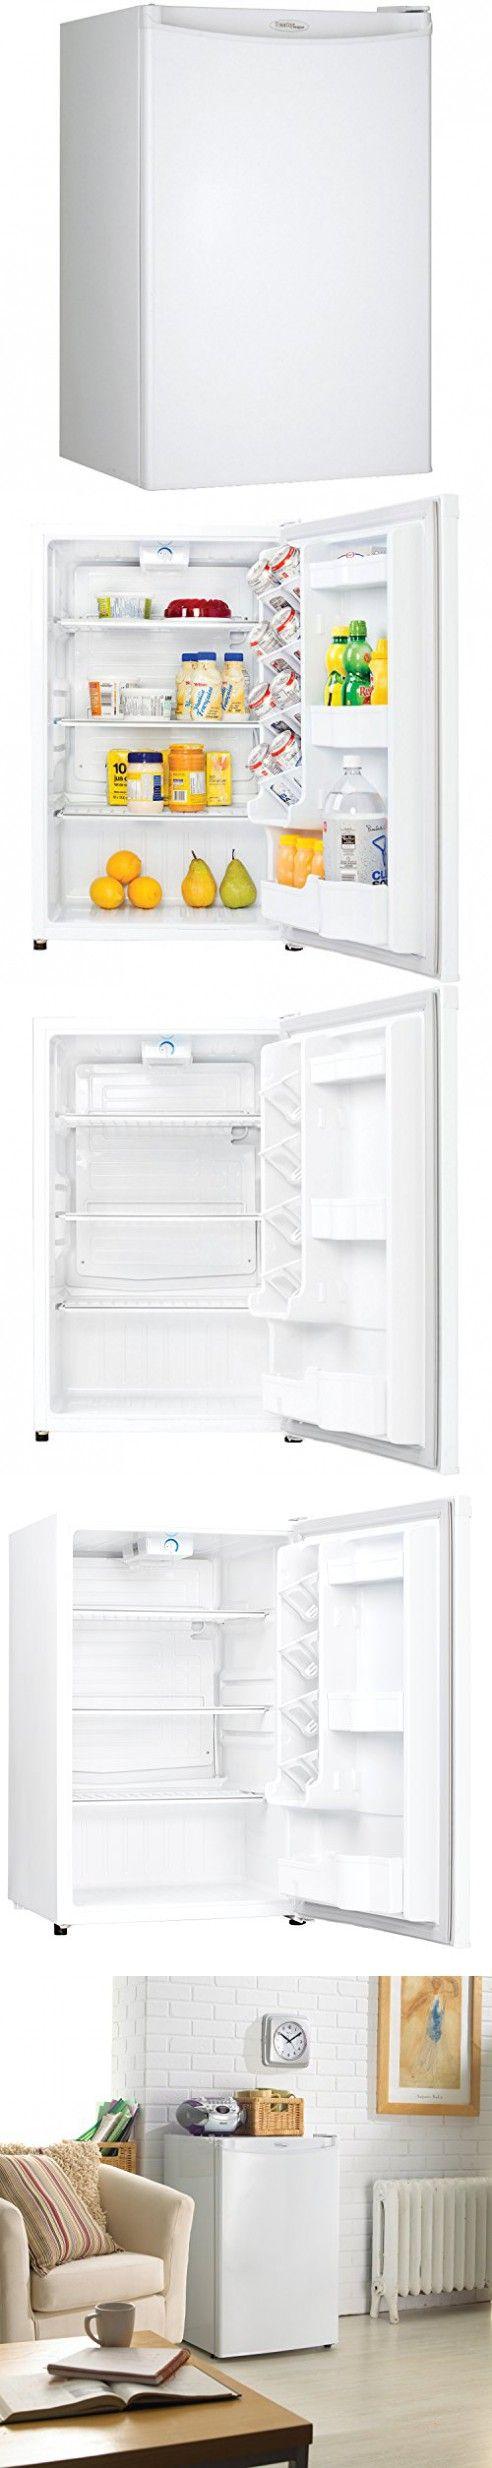 Danby DAR044A4WDD Compact All Refrigerator, 4.4 Cubic Feet, White